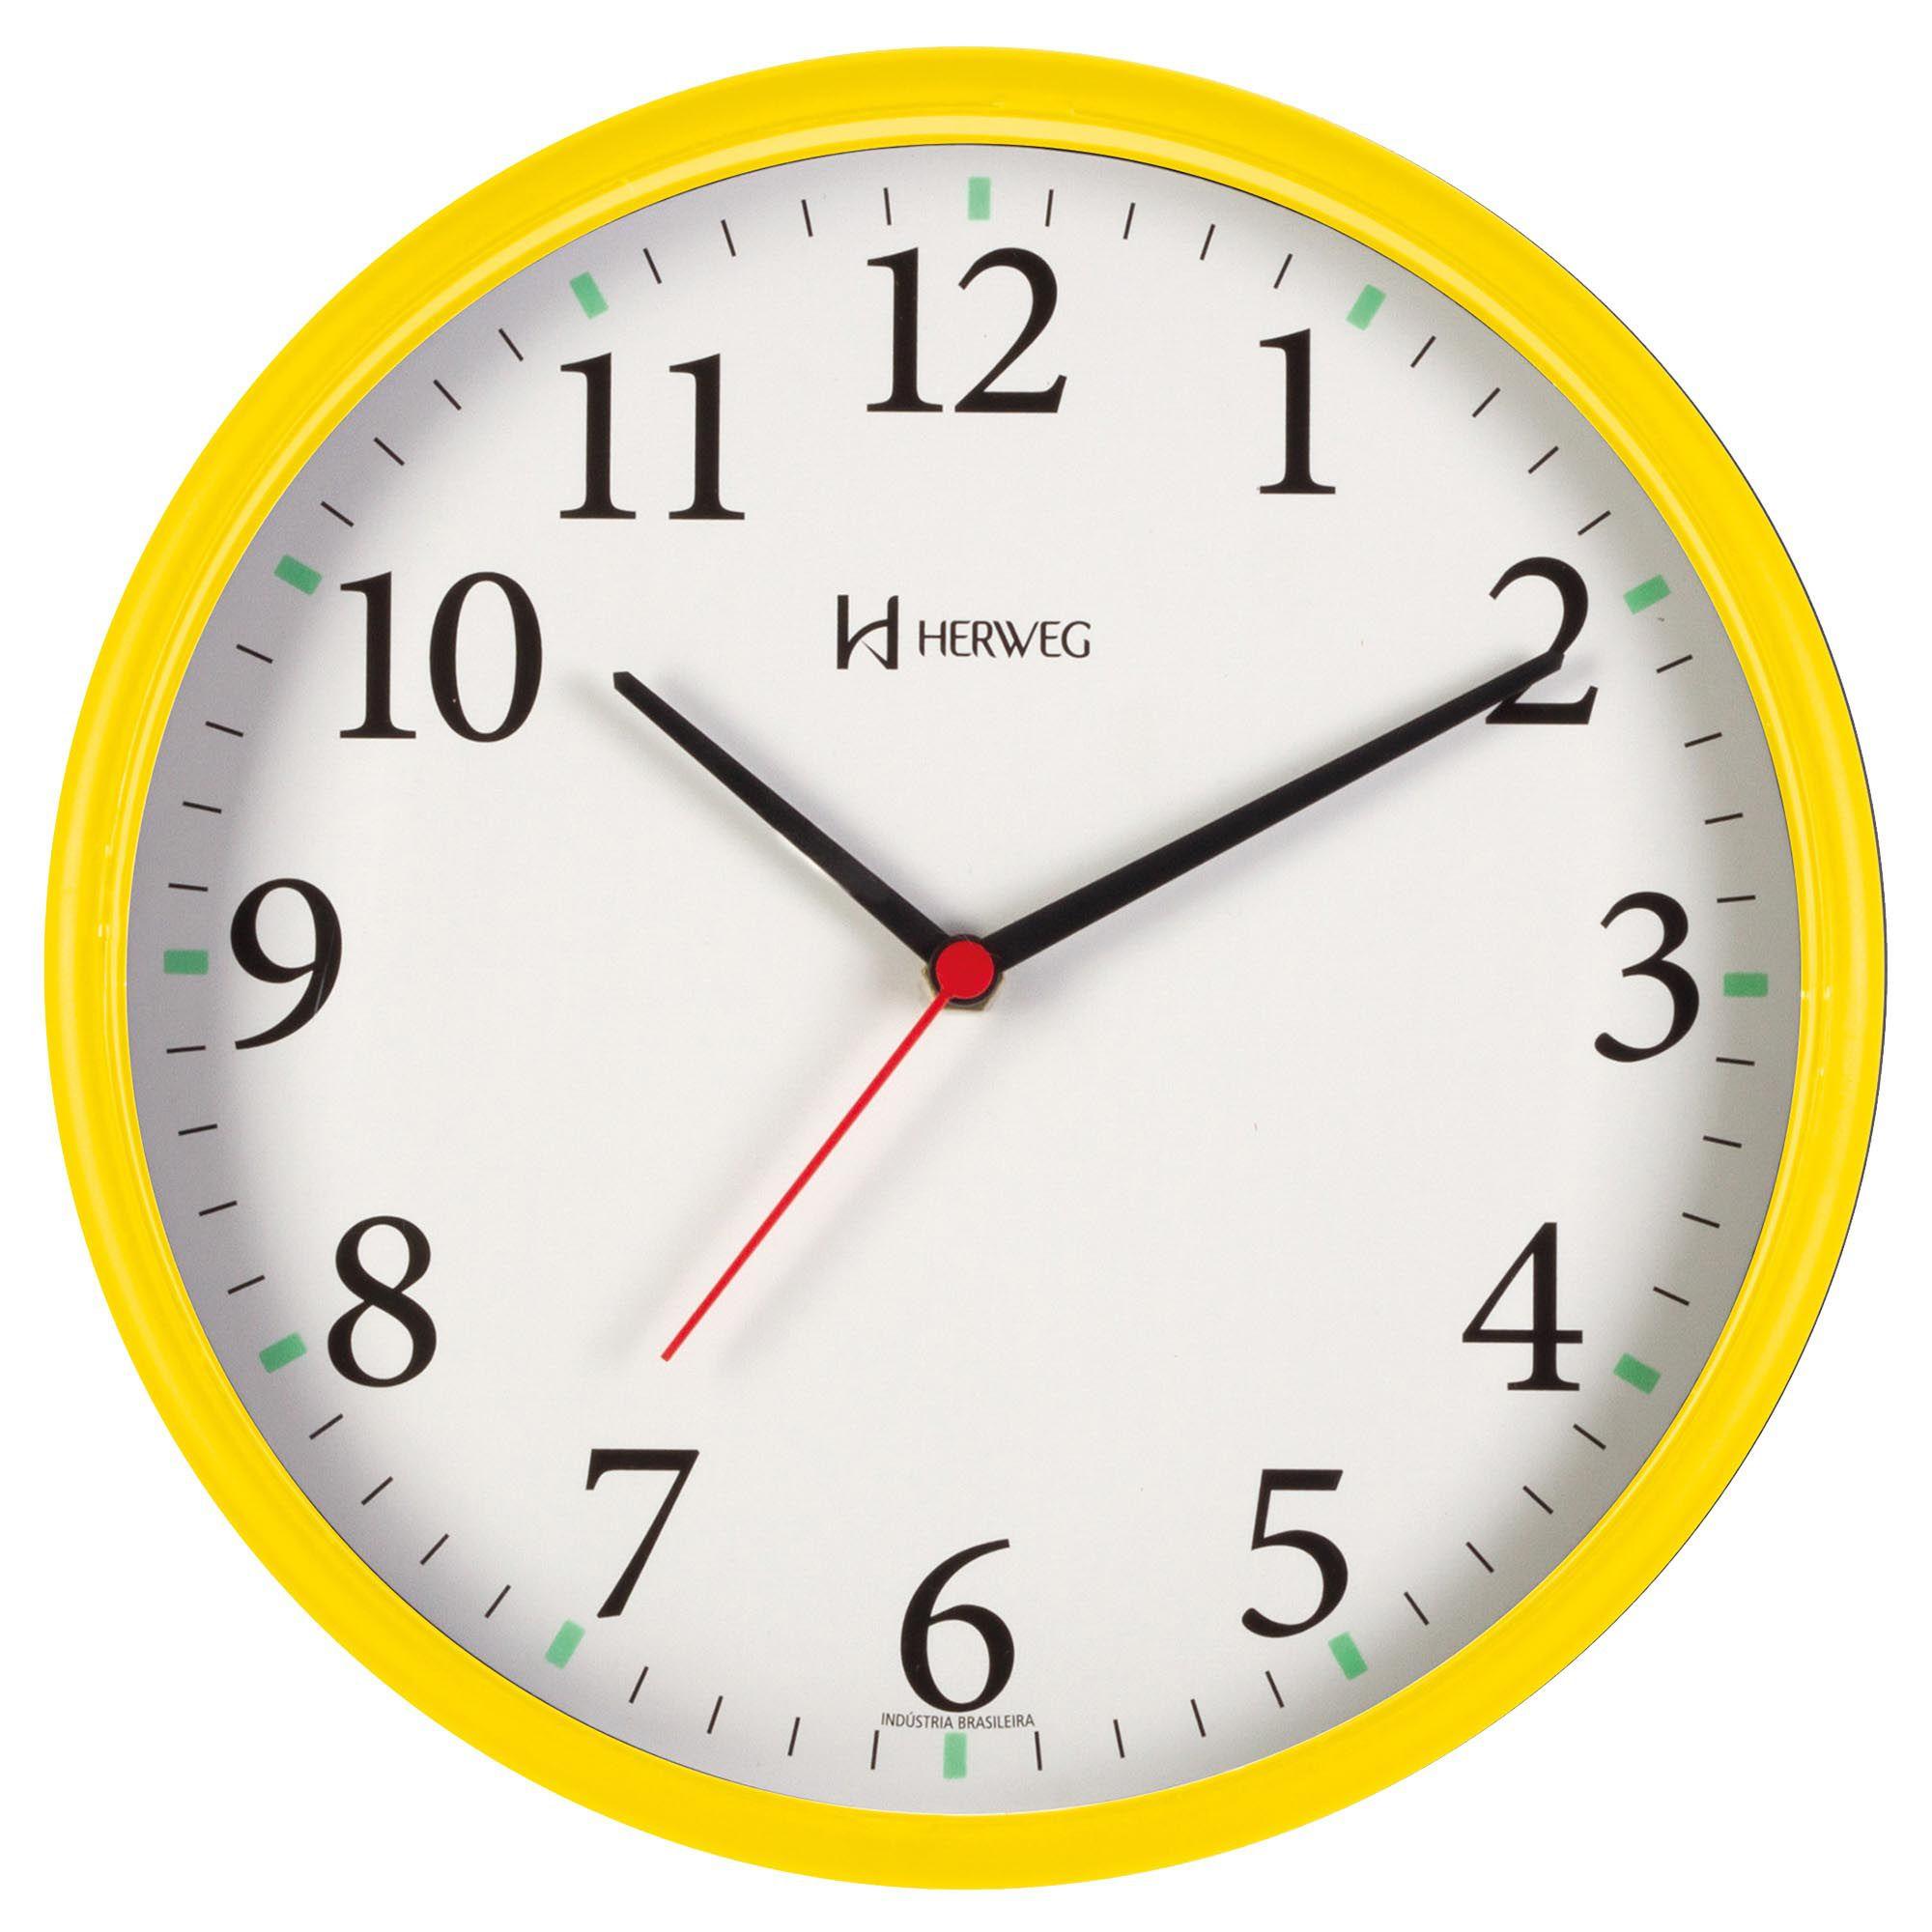 Relógio de Parede Analógico Herweg 660022 268 Amarelo Pantone